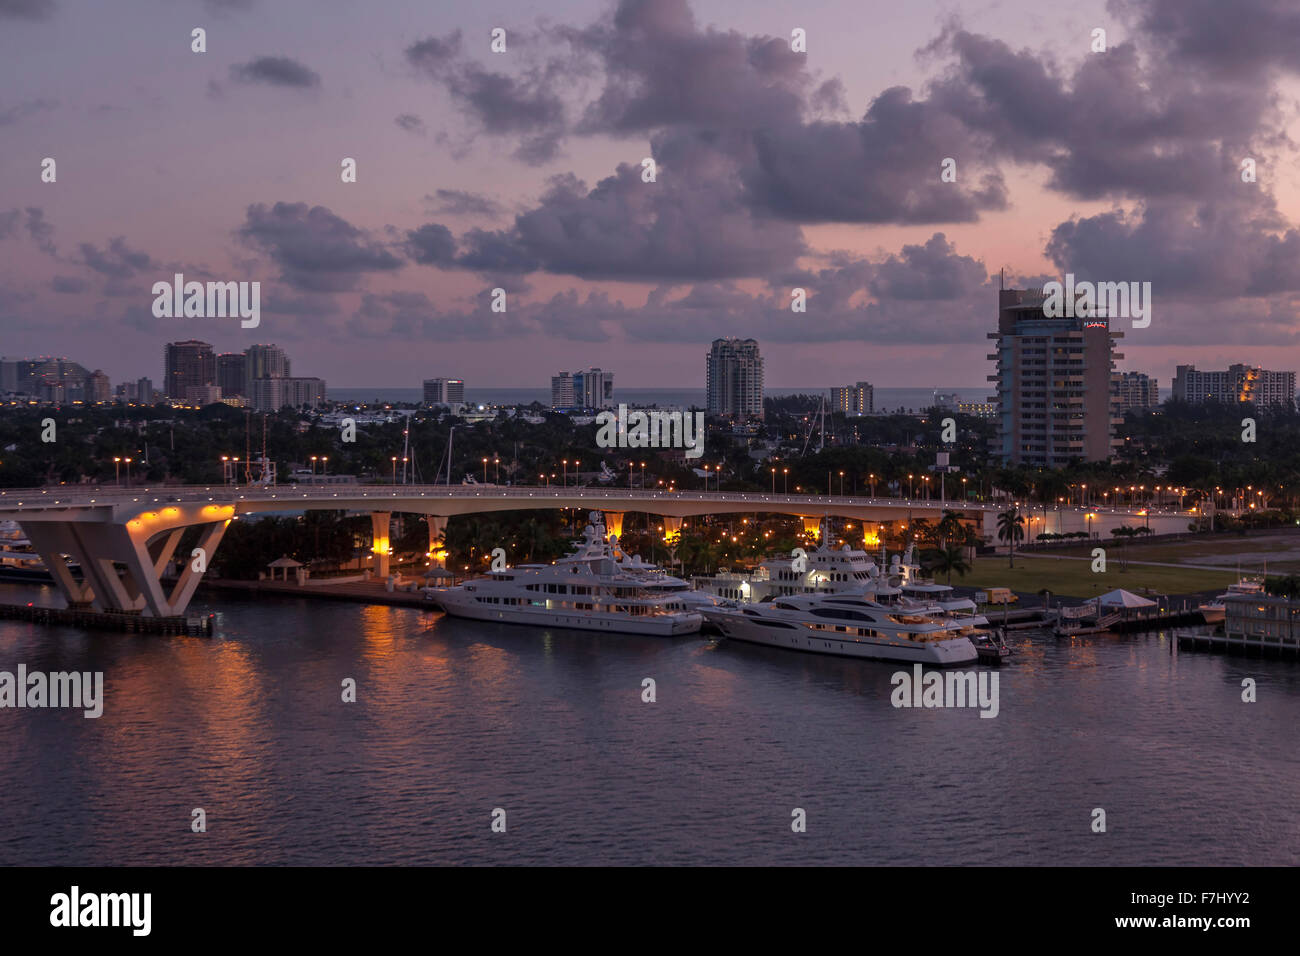 Motor cruises moored at sunrise in Port Everglades, Fort Lauderdale Florida Stock Photo